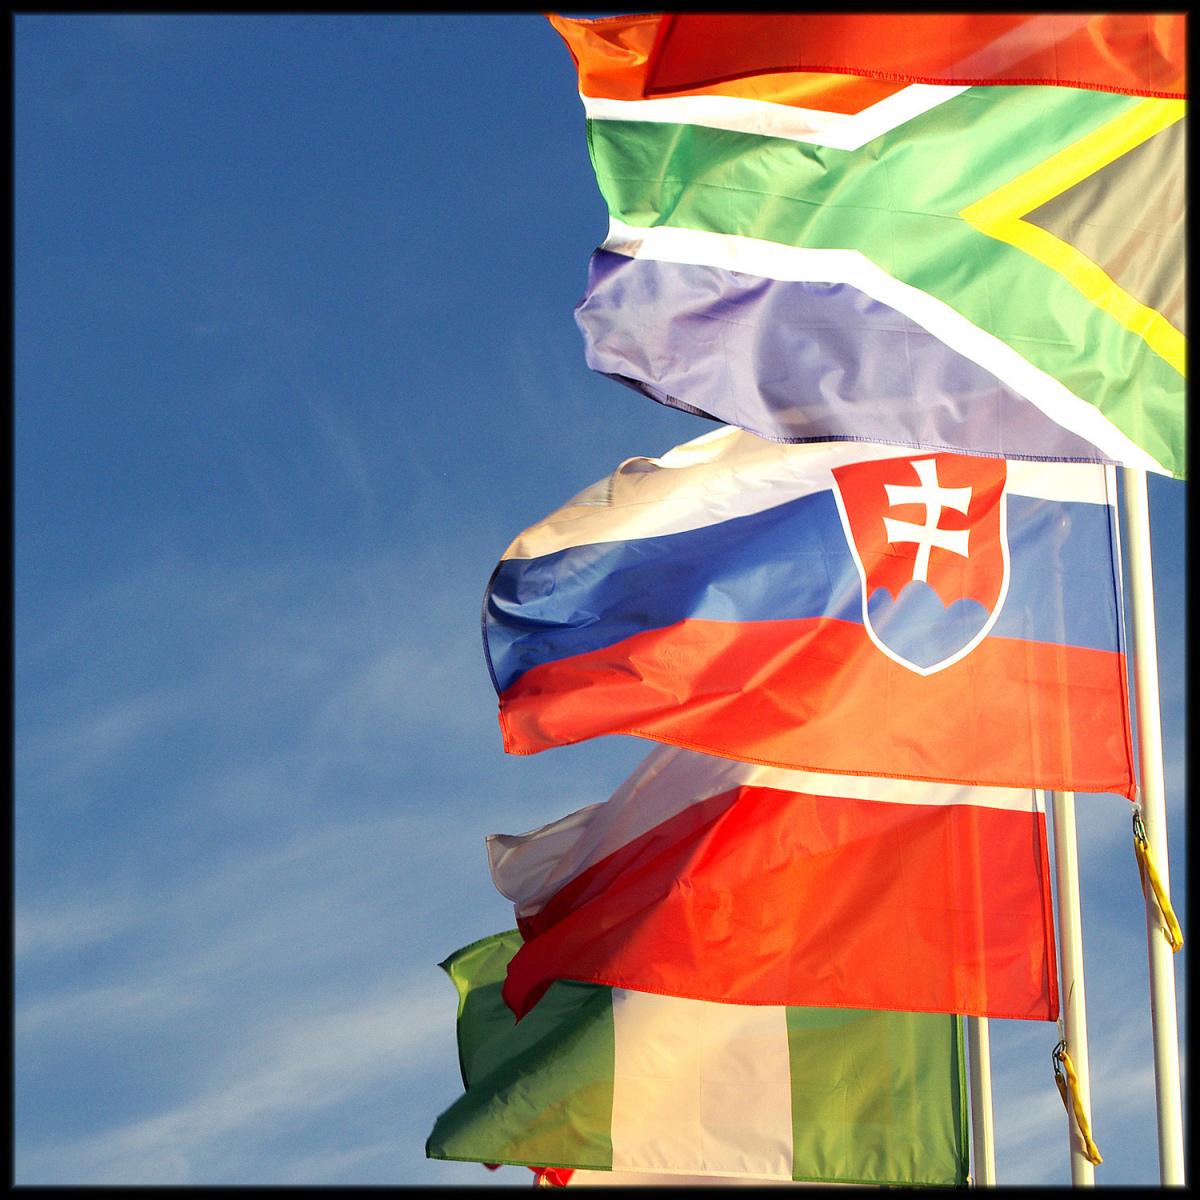 Flags-Sandra-Sergeant-Photography-Basingstoke-Passport-Photographs